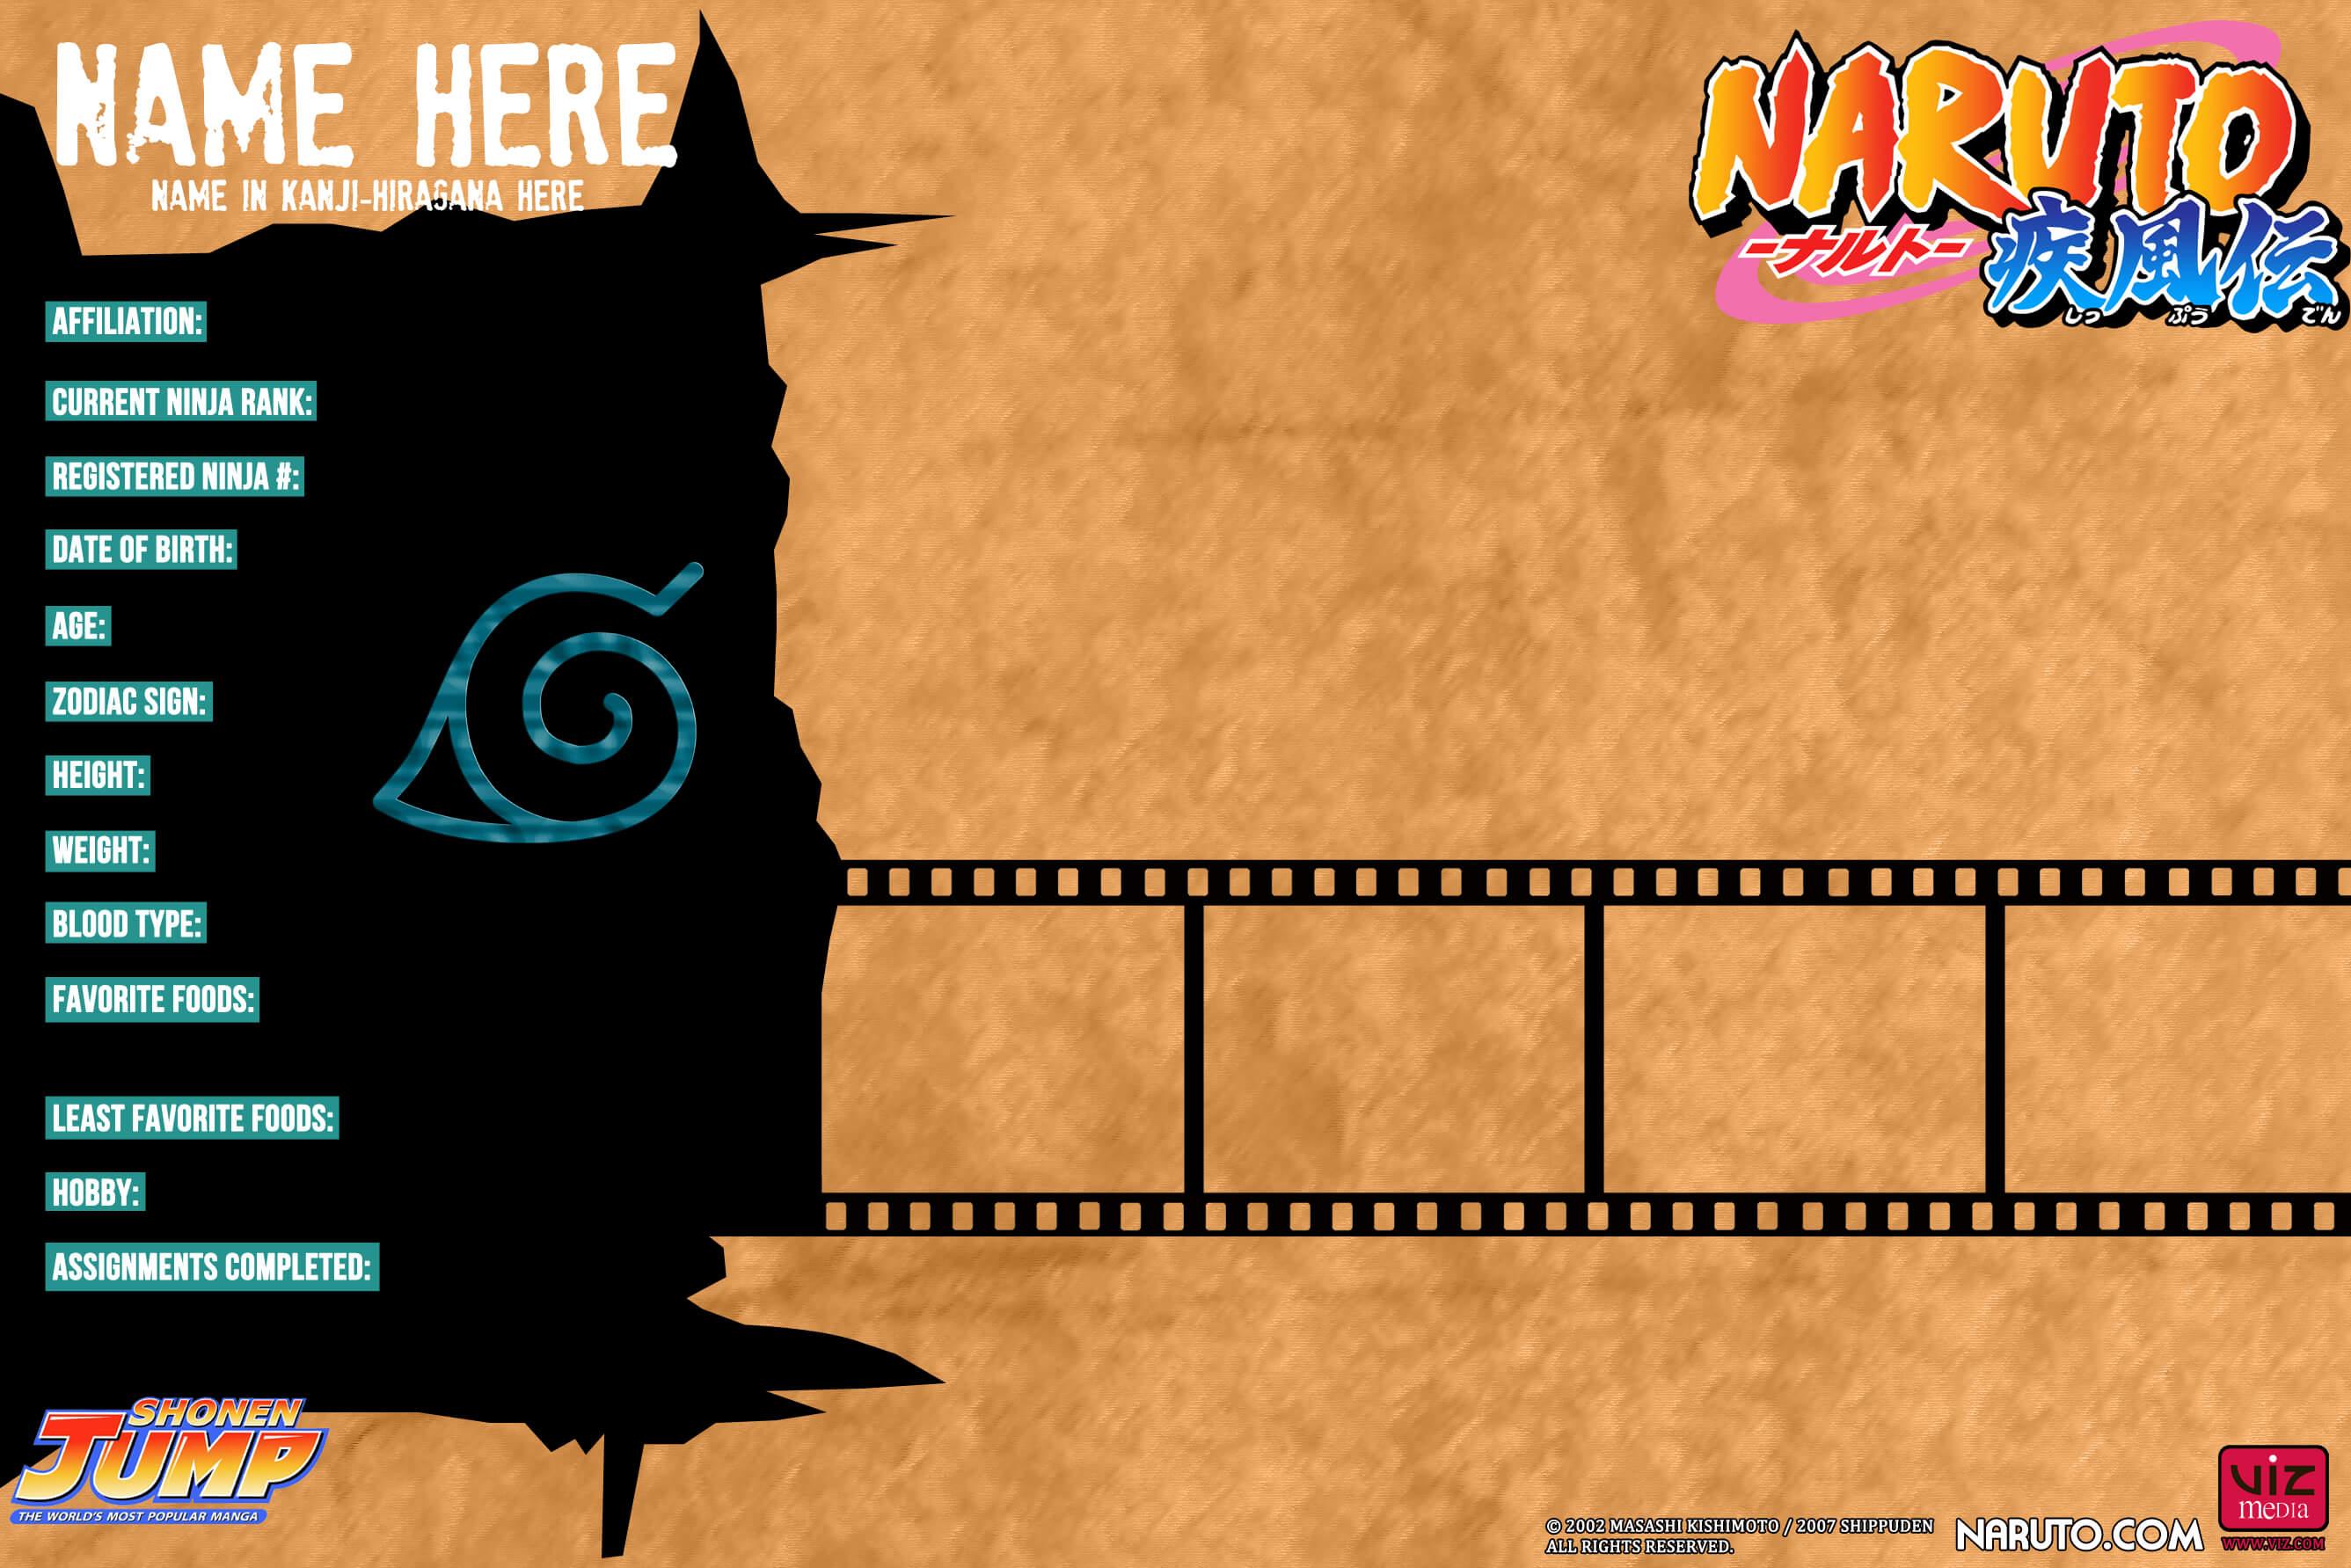 Naruto Shippuden: Bio Card Template*:.dreamchaser21 On Regarding Bio Card Template